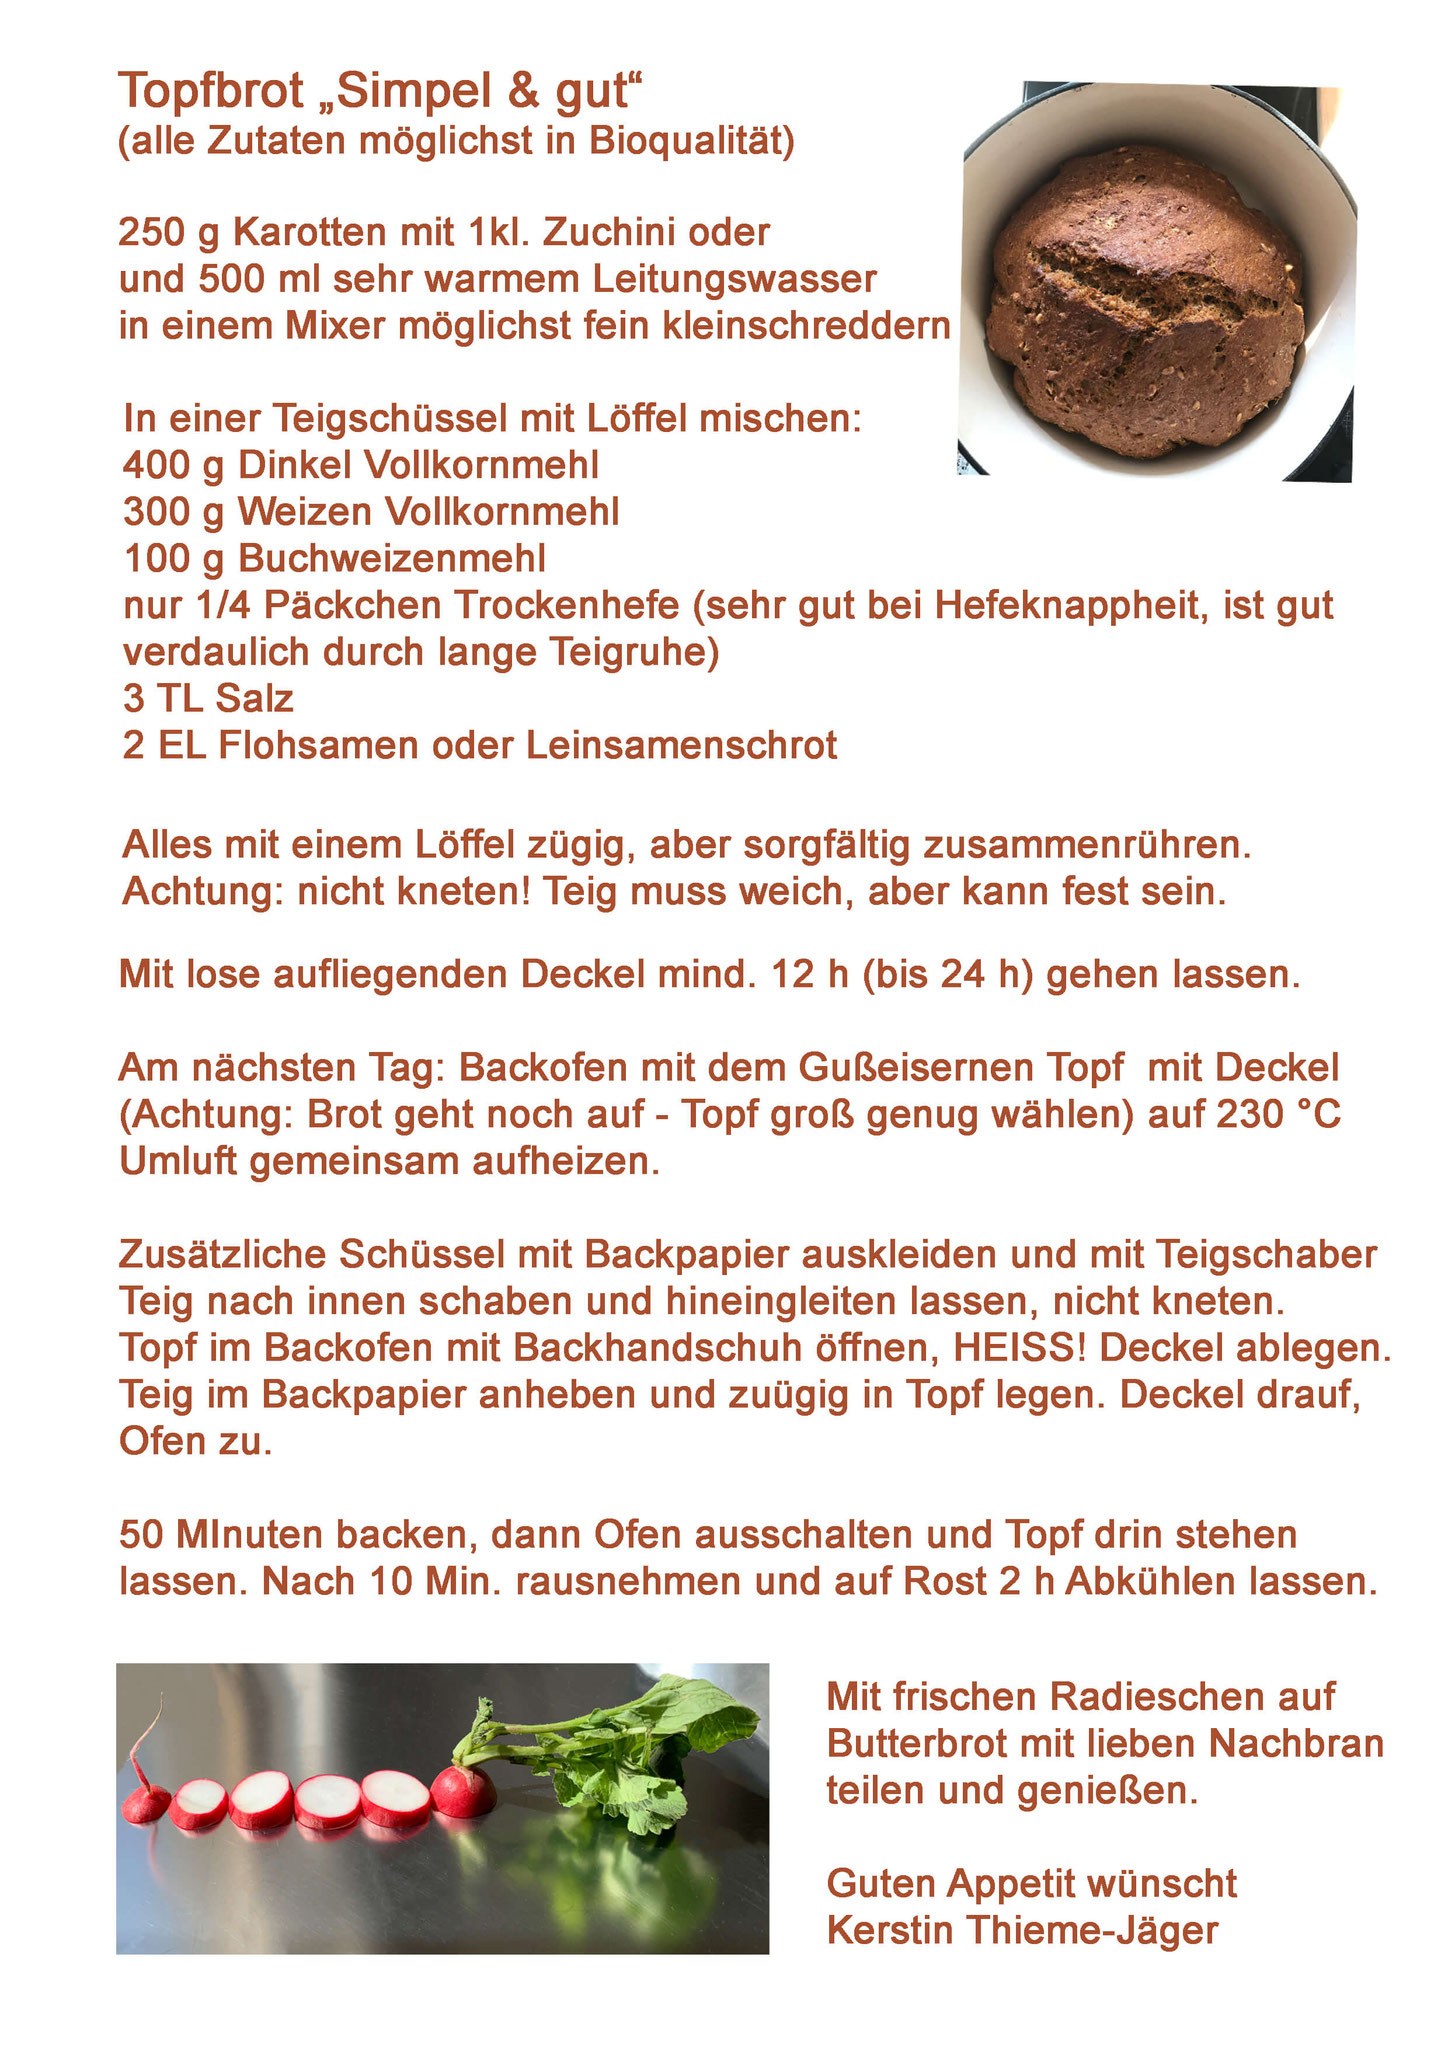 17b Topfbrot-Rezept, Thieme-Jäger #tagdernachbarn